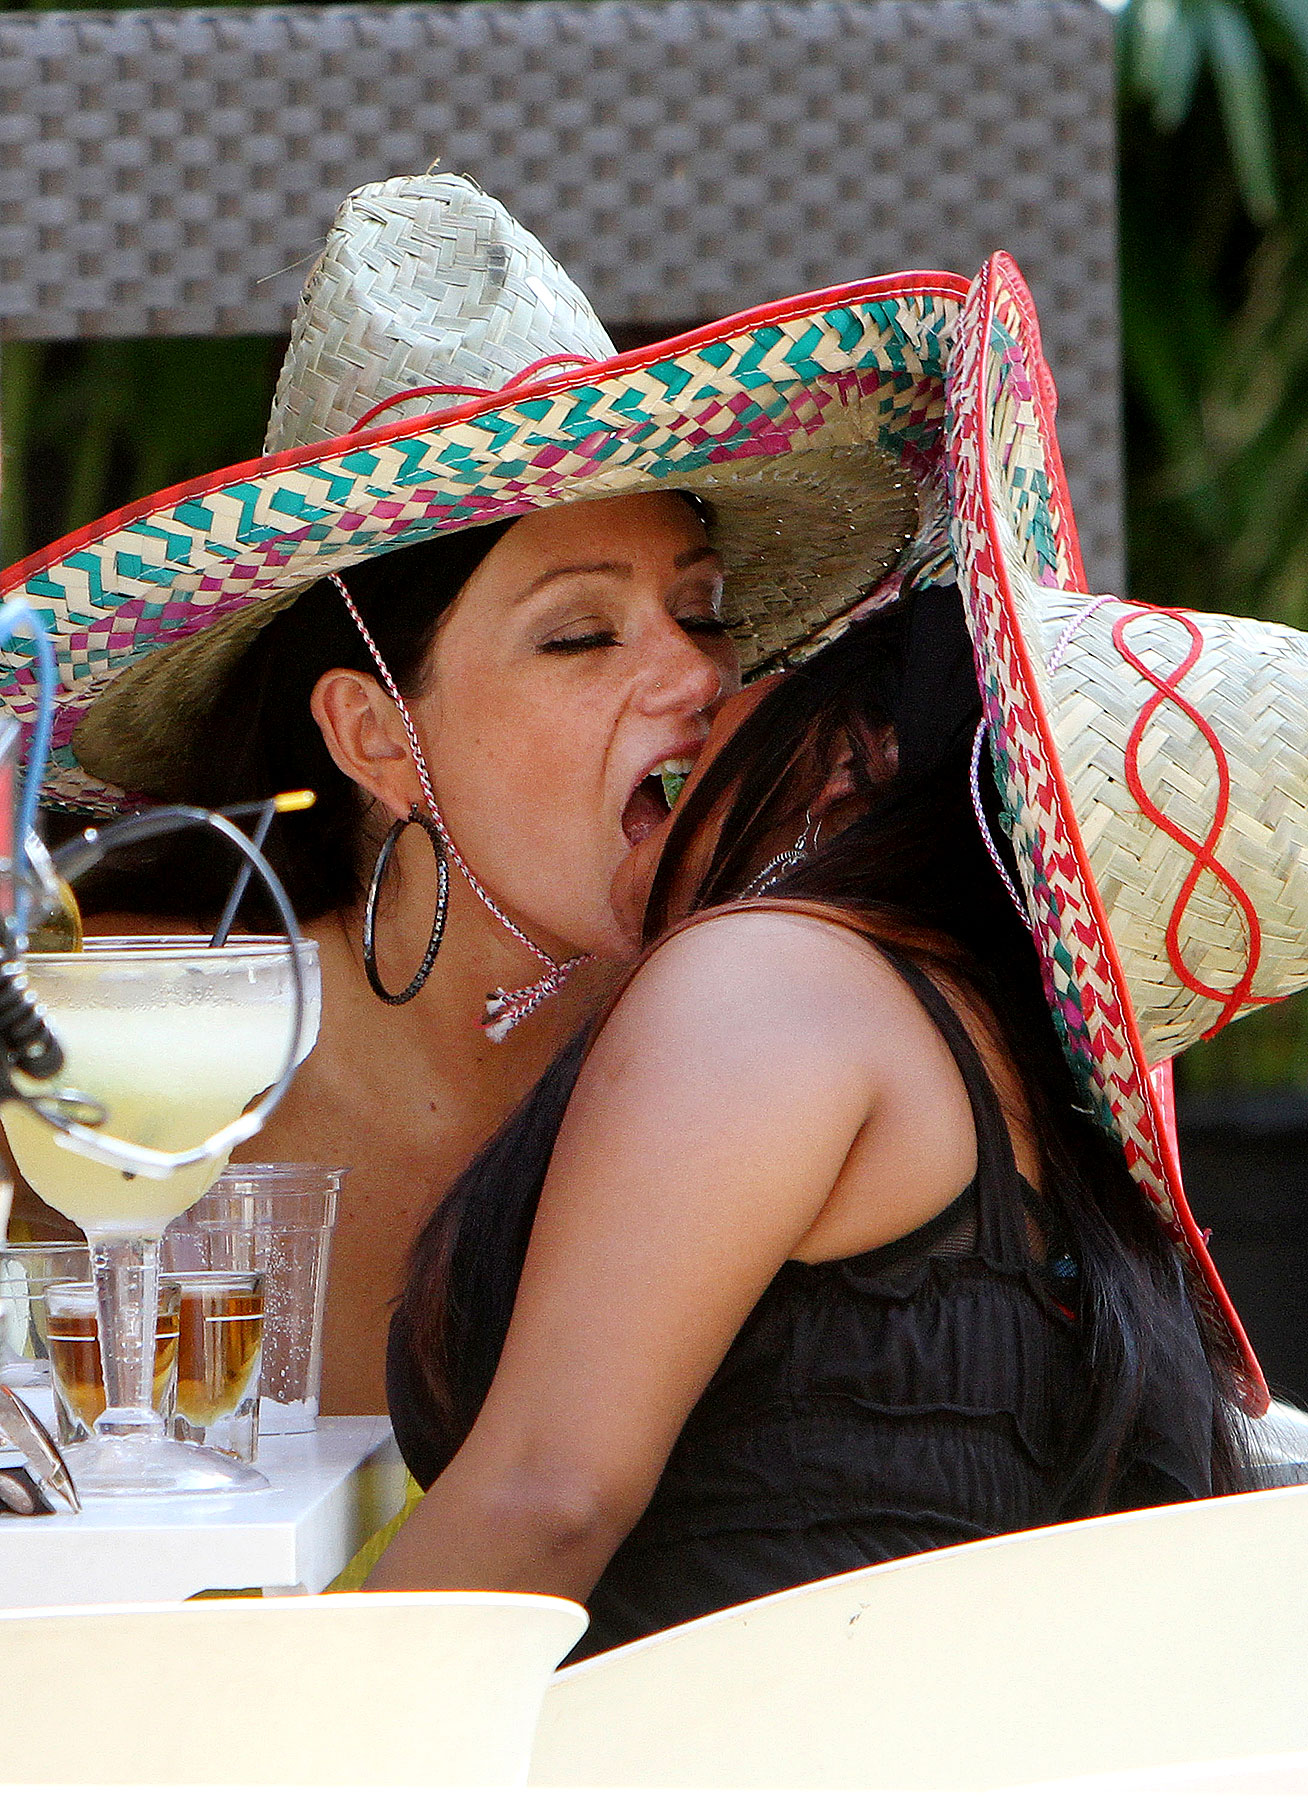 Snooki and JWoww Get Loco For Cinco de Mayo (PHOTOS)